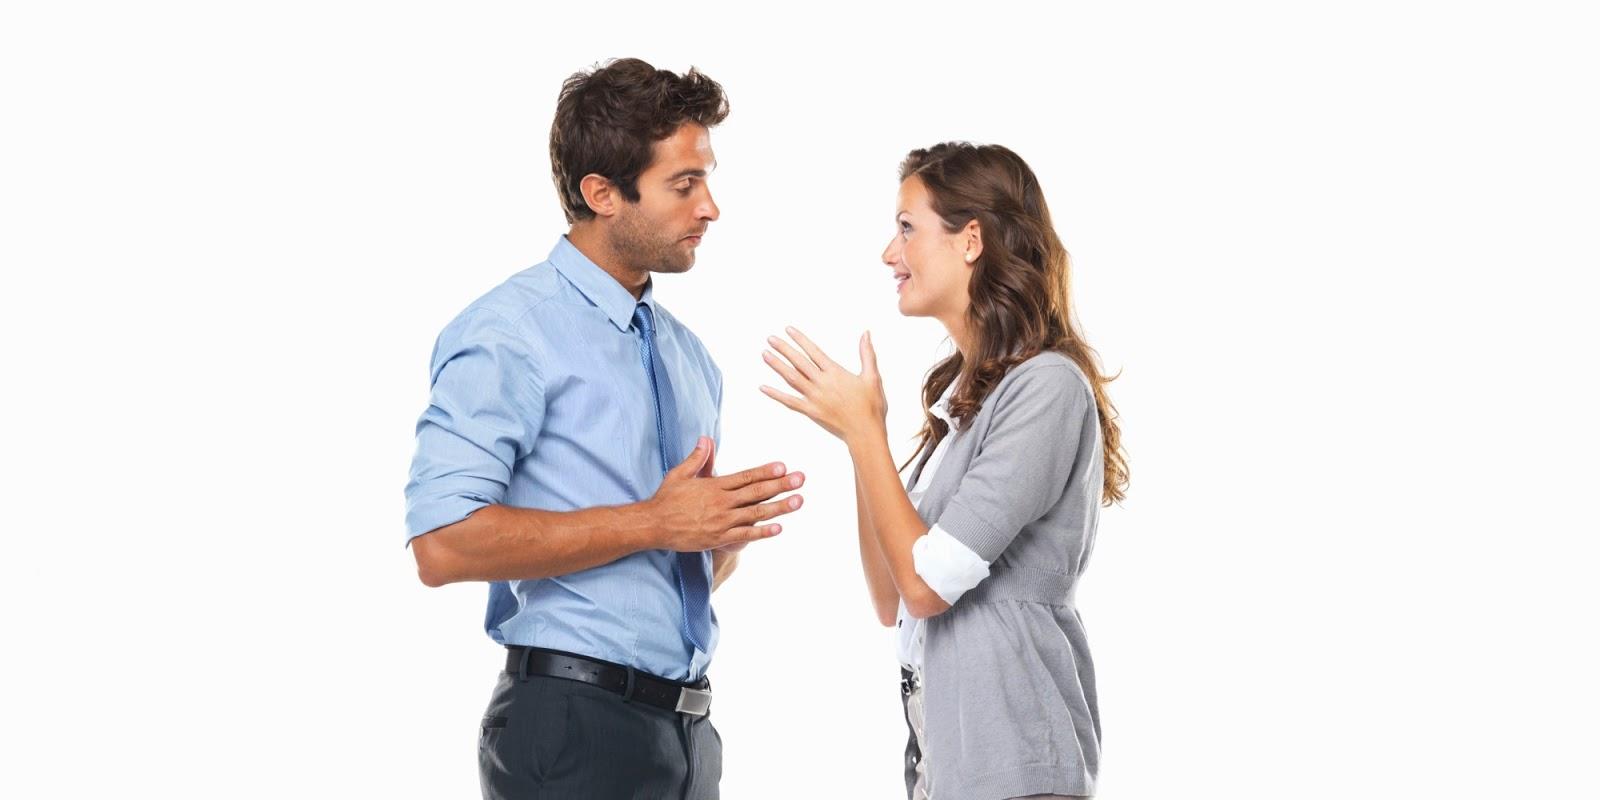 Hasil gambar untuk berdiskusi 2 orang